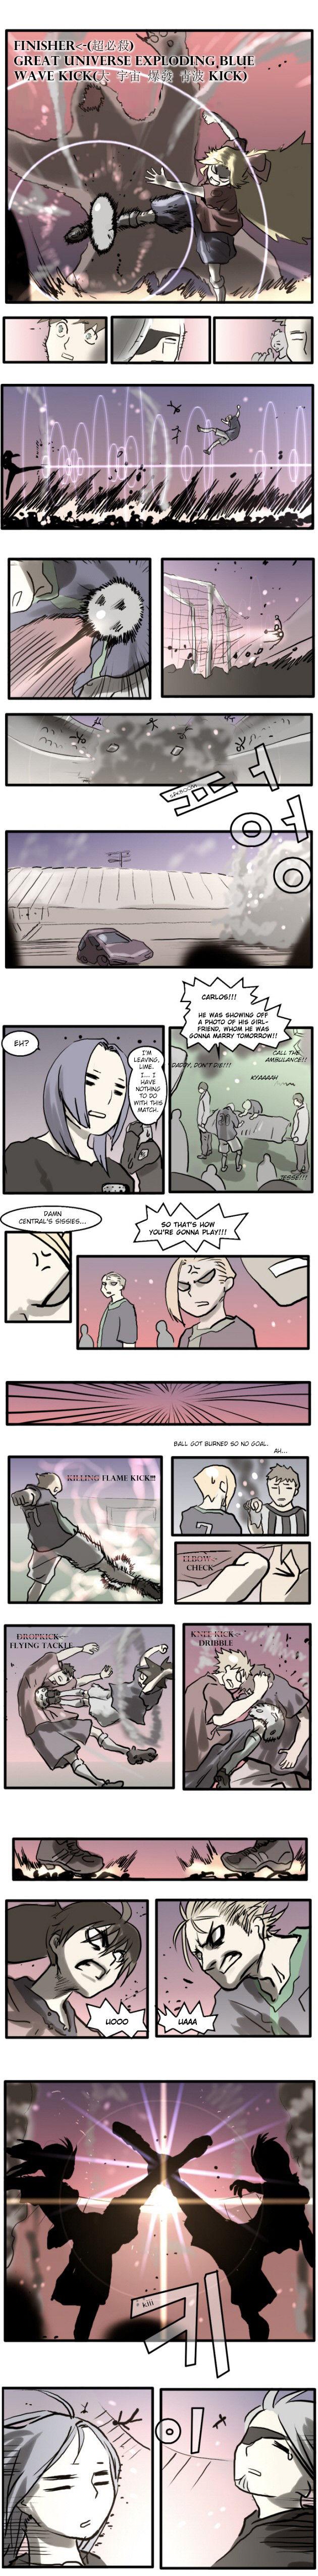 Knight Run 50.5 Page 2